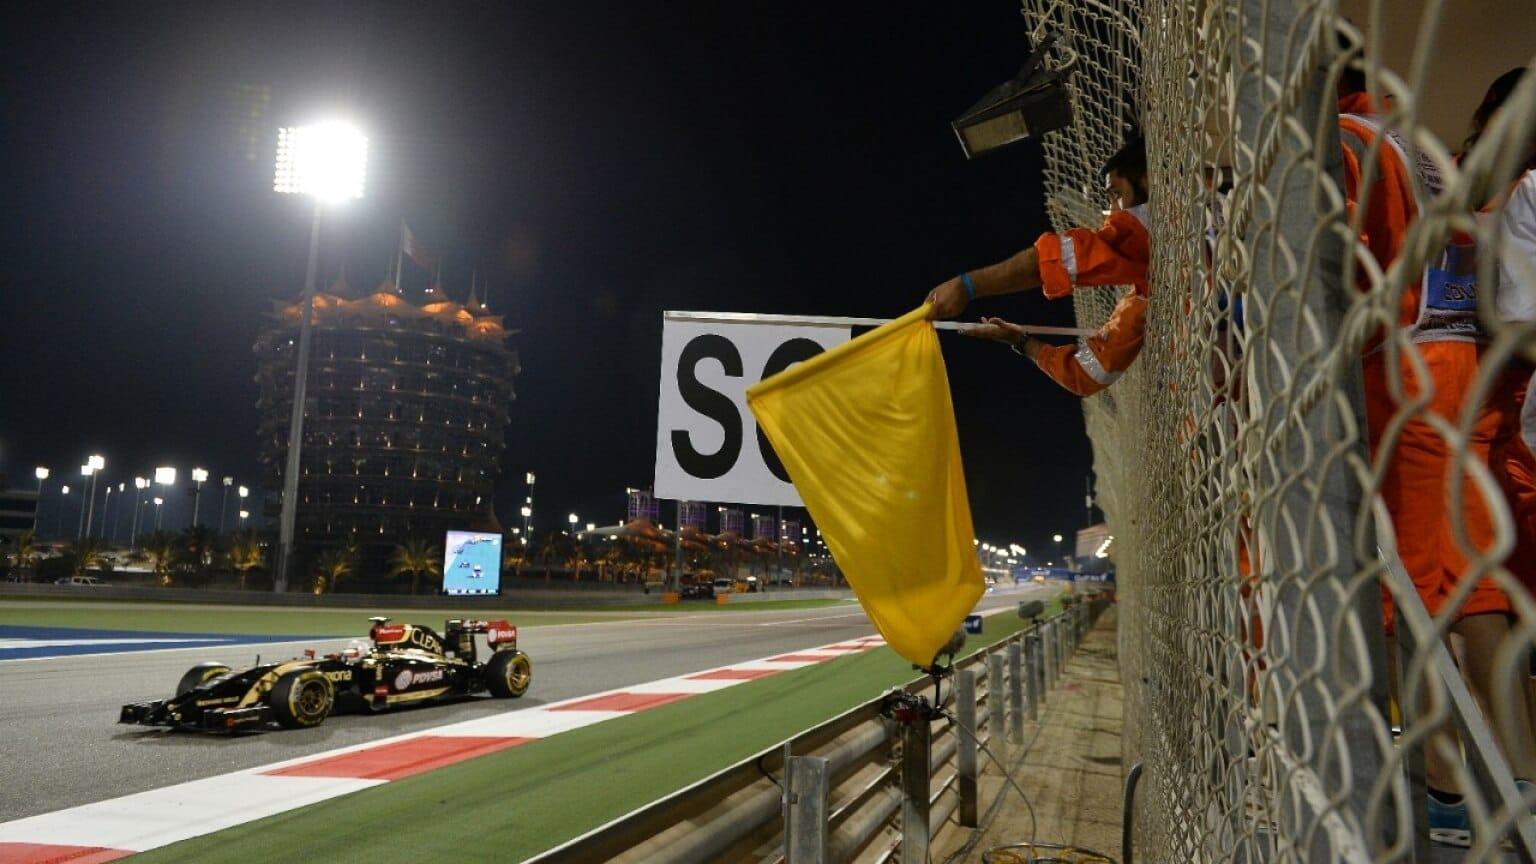 Bandeira amarela da Fórmula 1